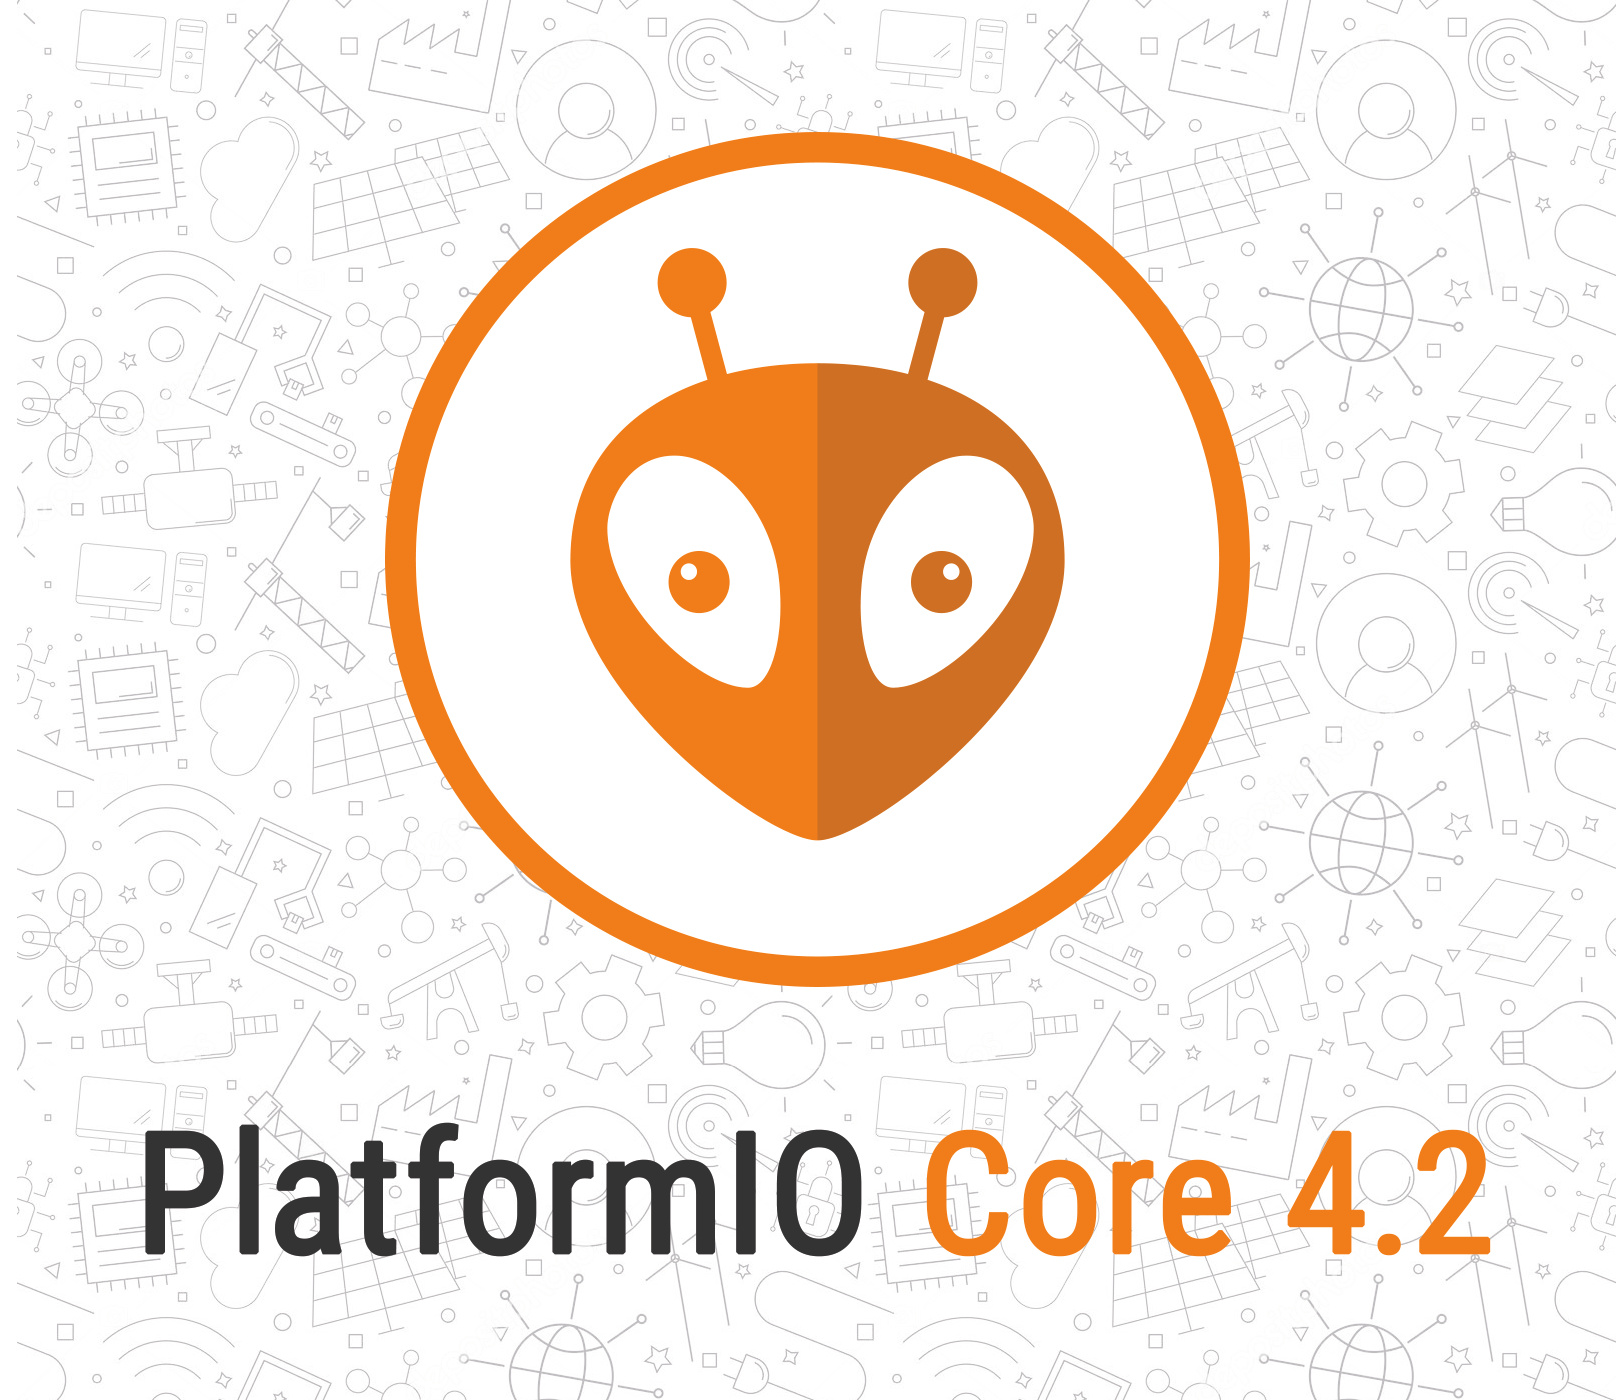 platformio_core_4_0